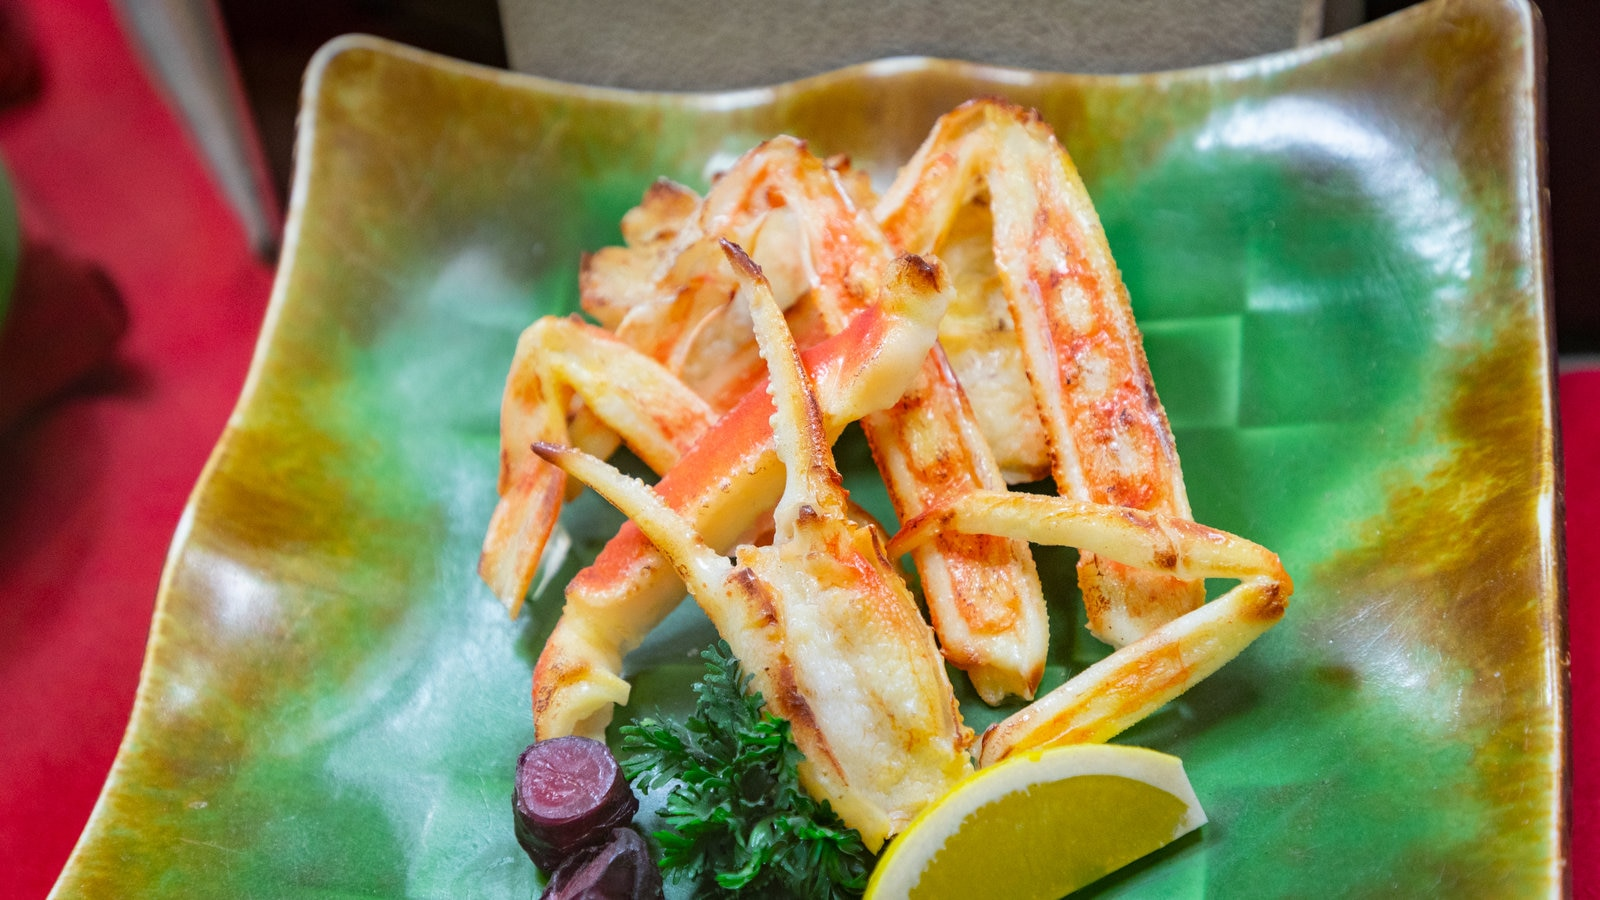 Fukuoka which includes food